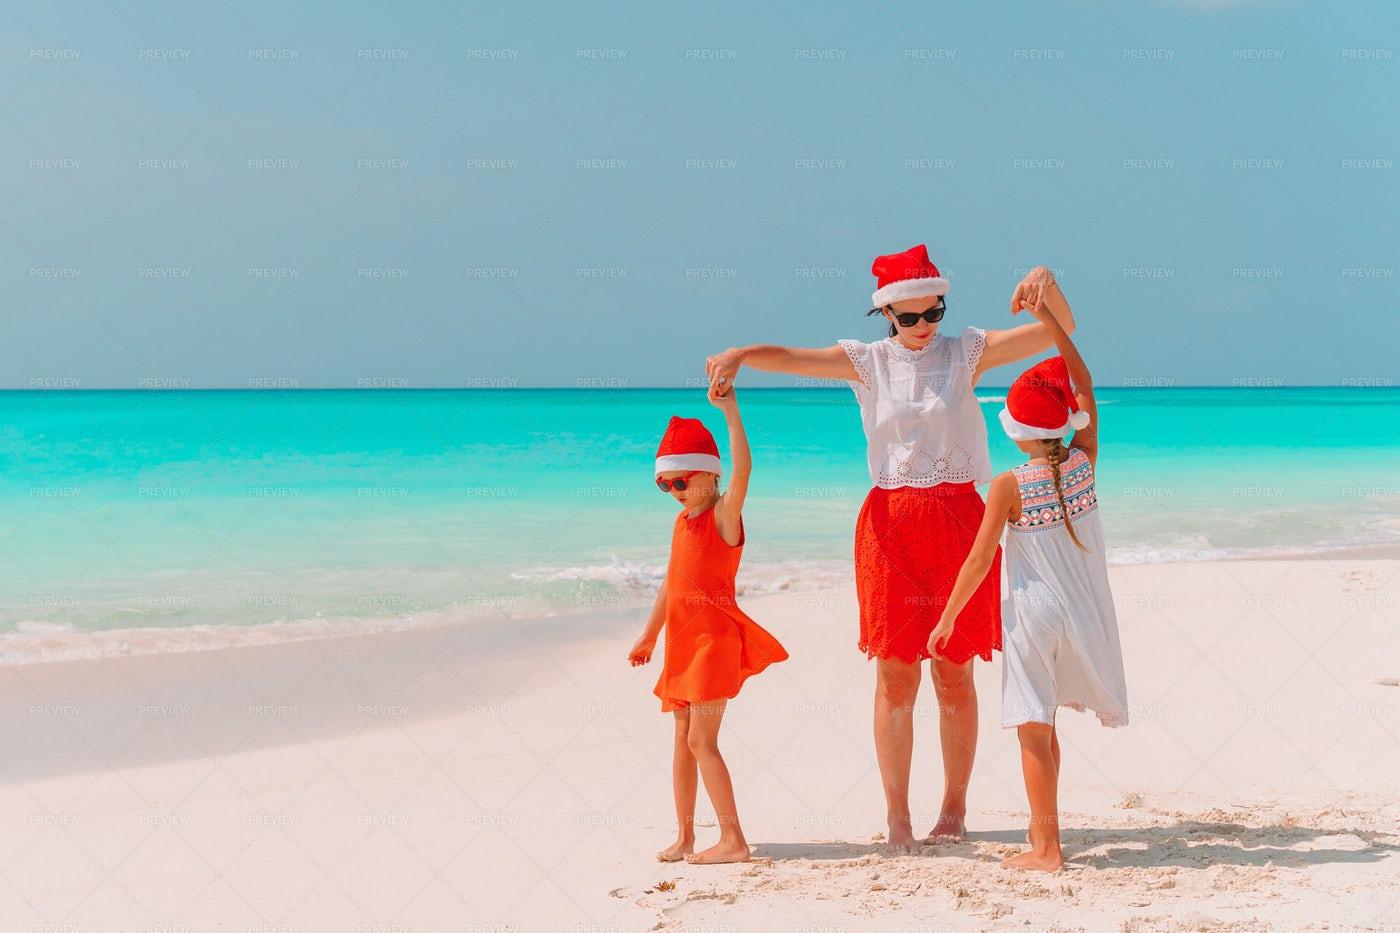 Dancing On Beach With Santa Hats: Stock Photos